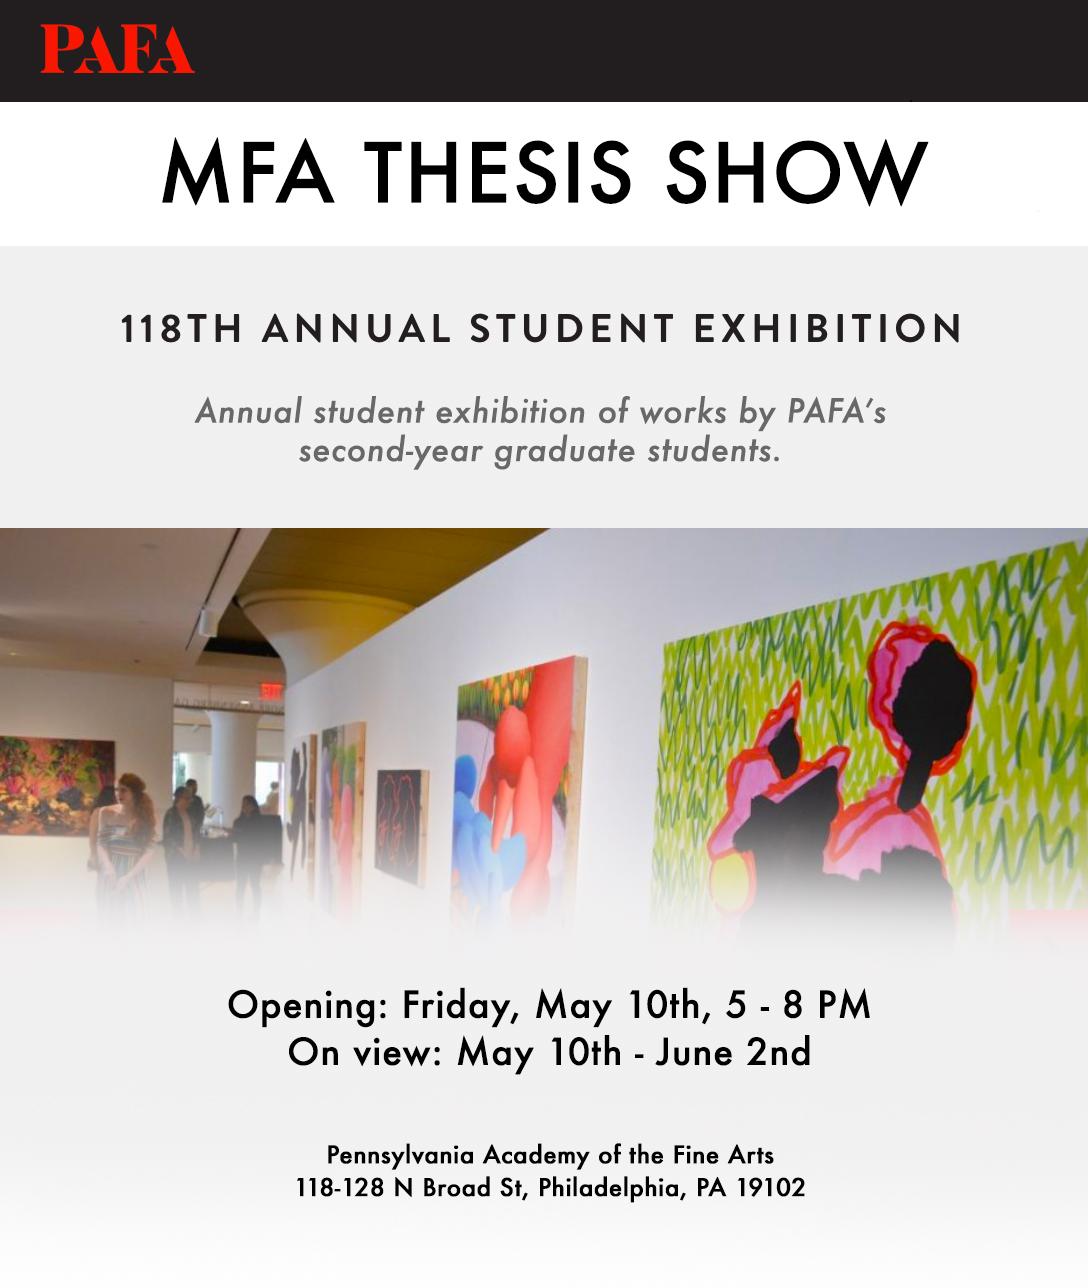 mfa-thesis-show.jpg